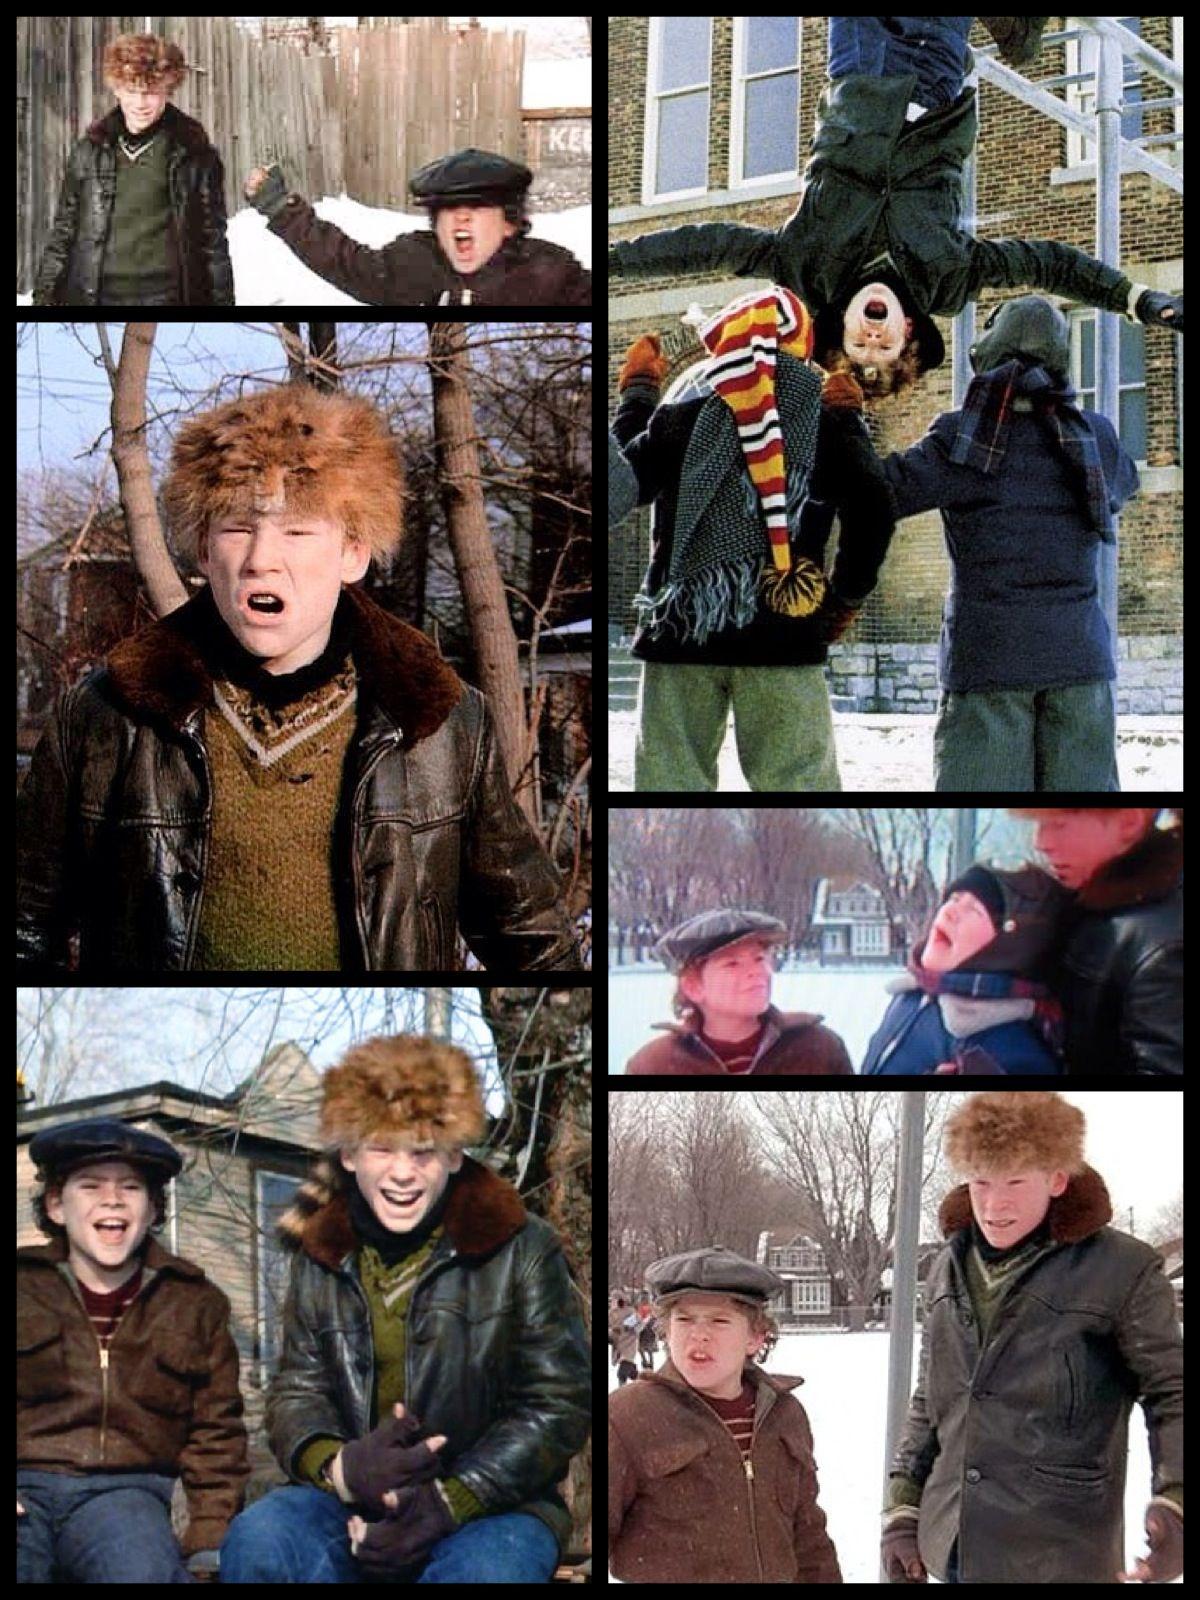 The Christmas Story Bully.A Christmas Story 1983 The Bullies Scut Farkus What A